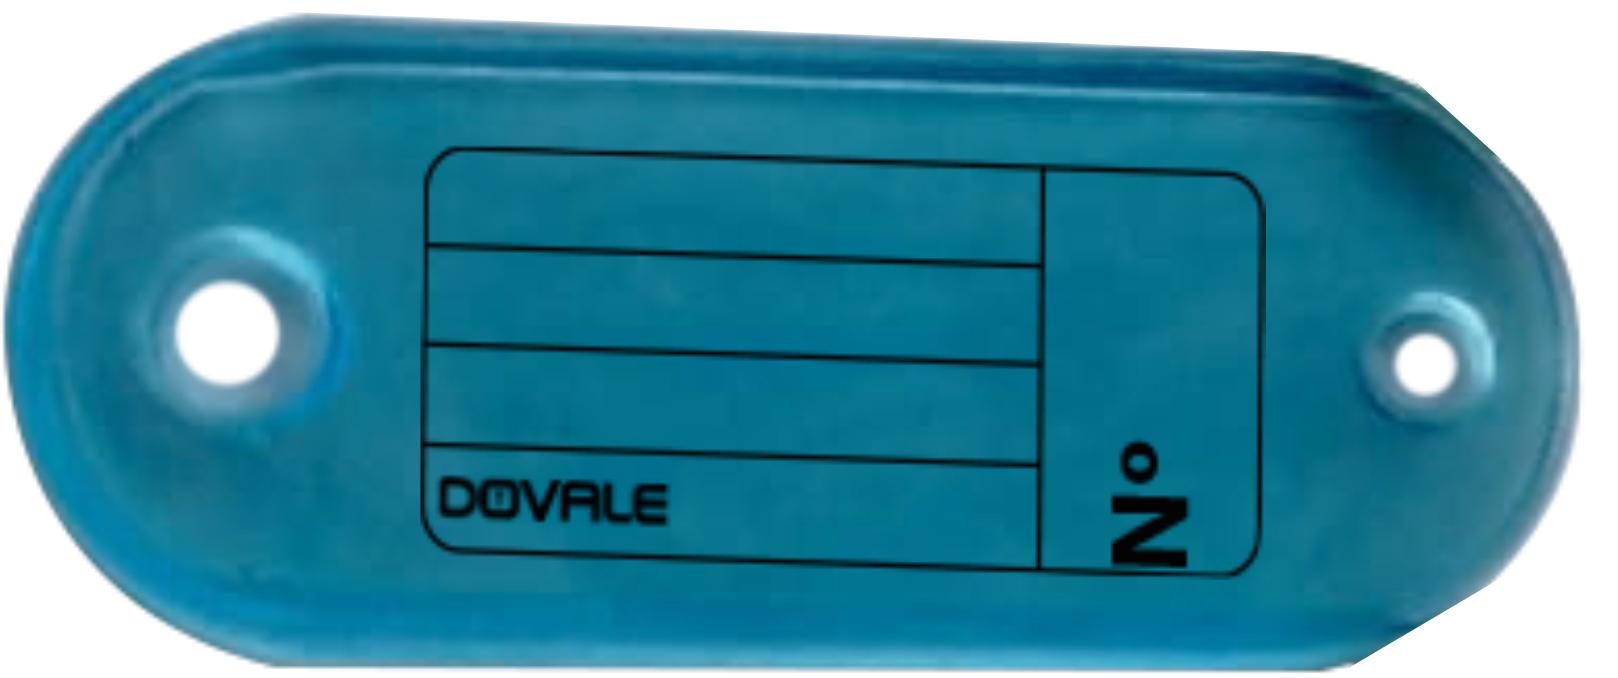 Etiqueta Dovale p/ Chaves Modelo 1 Azul Pacote sortido c/100 - 77268